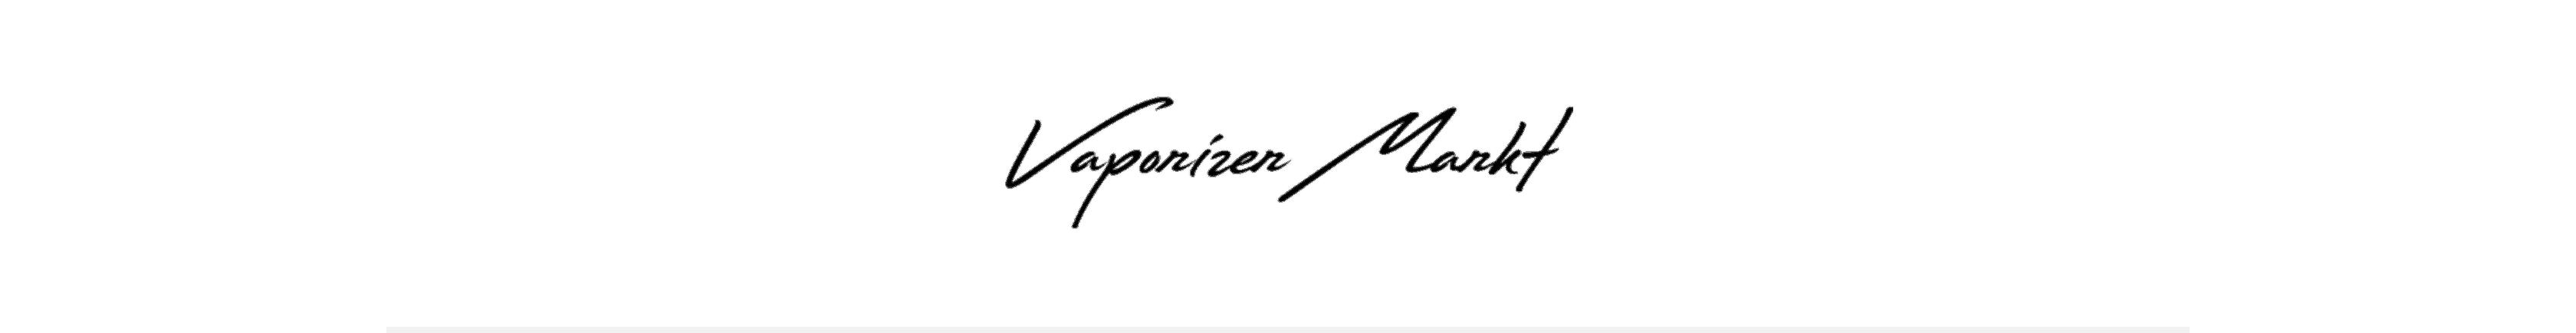 Vaporizer Markt Logo